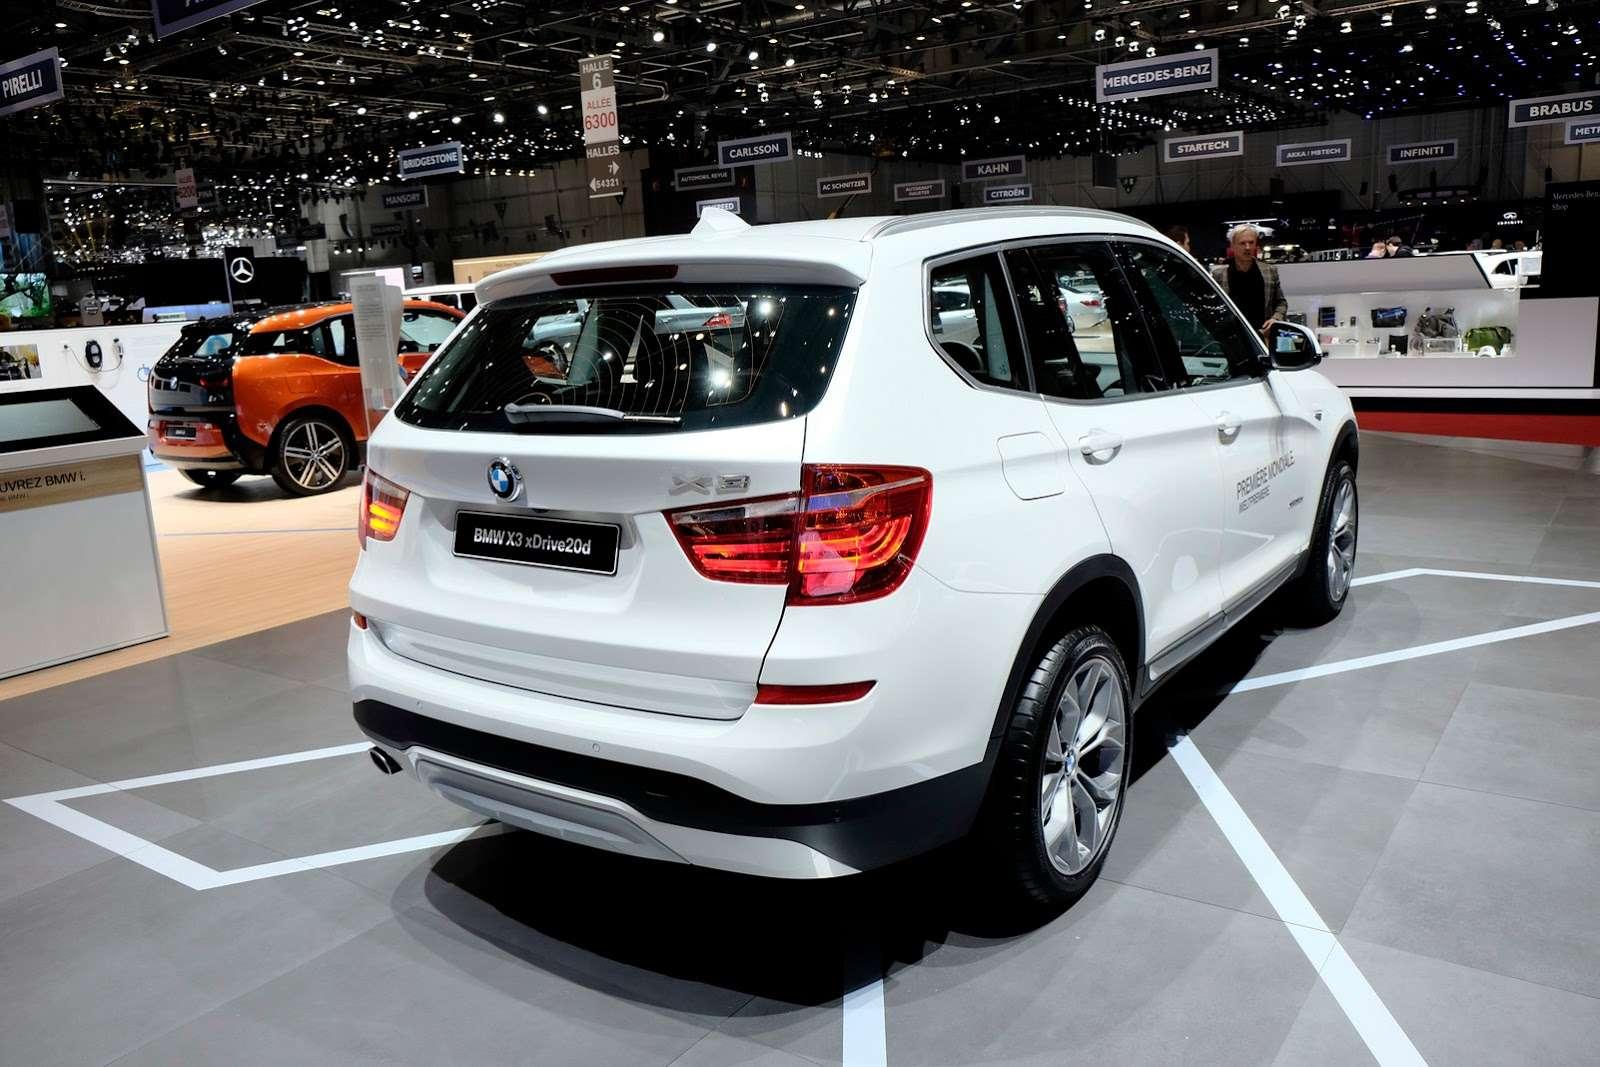 BMW x3 geneva